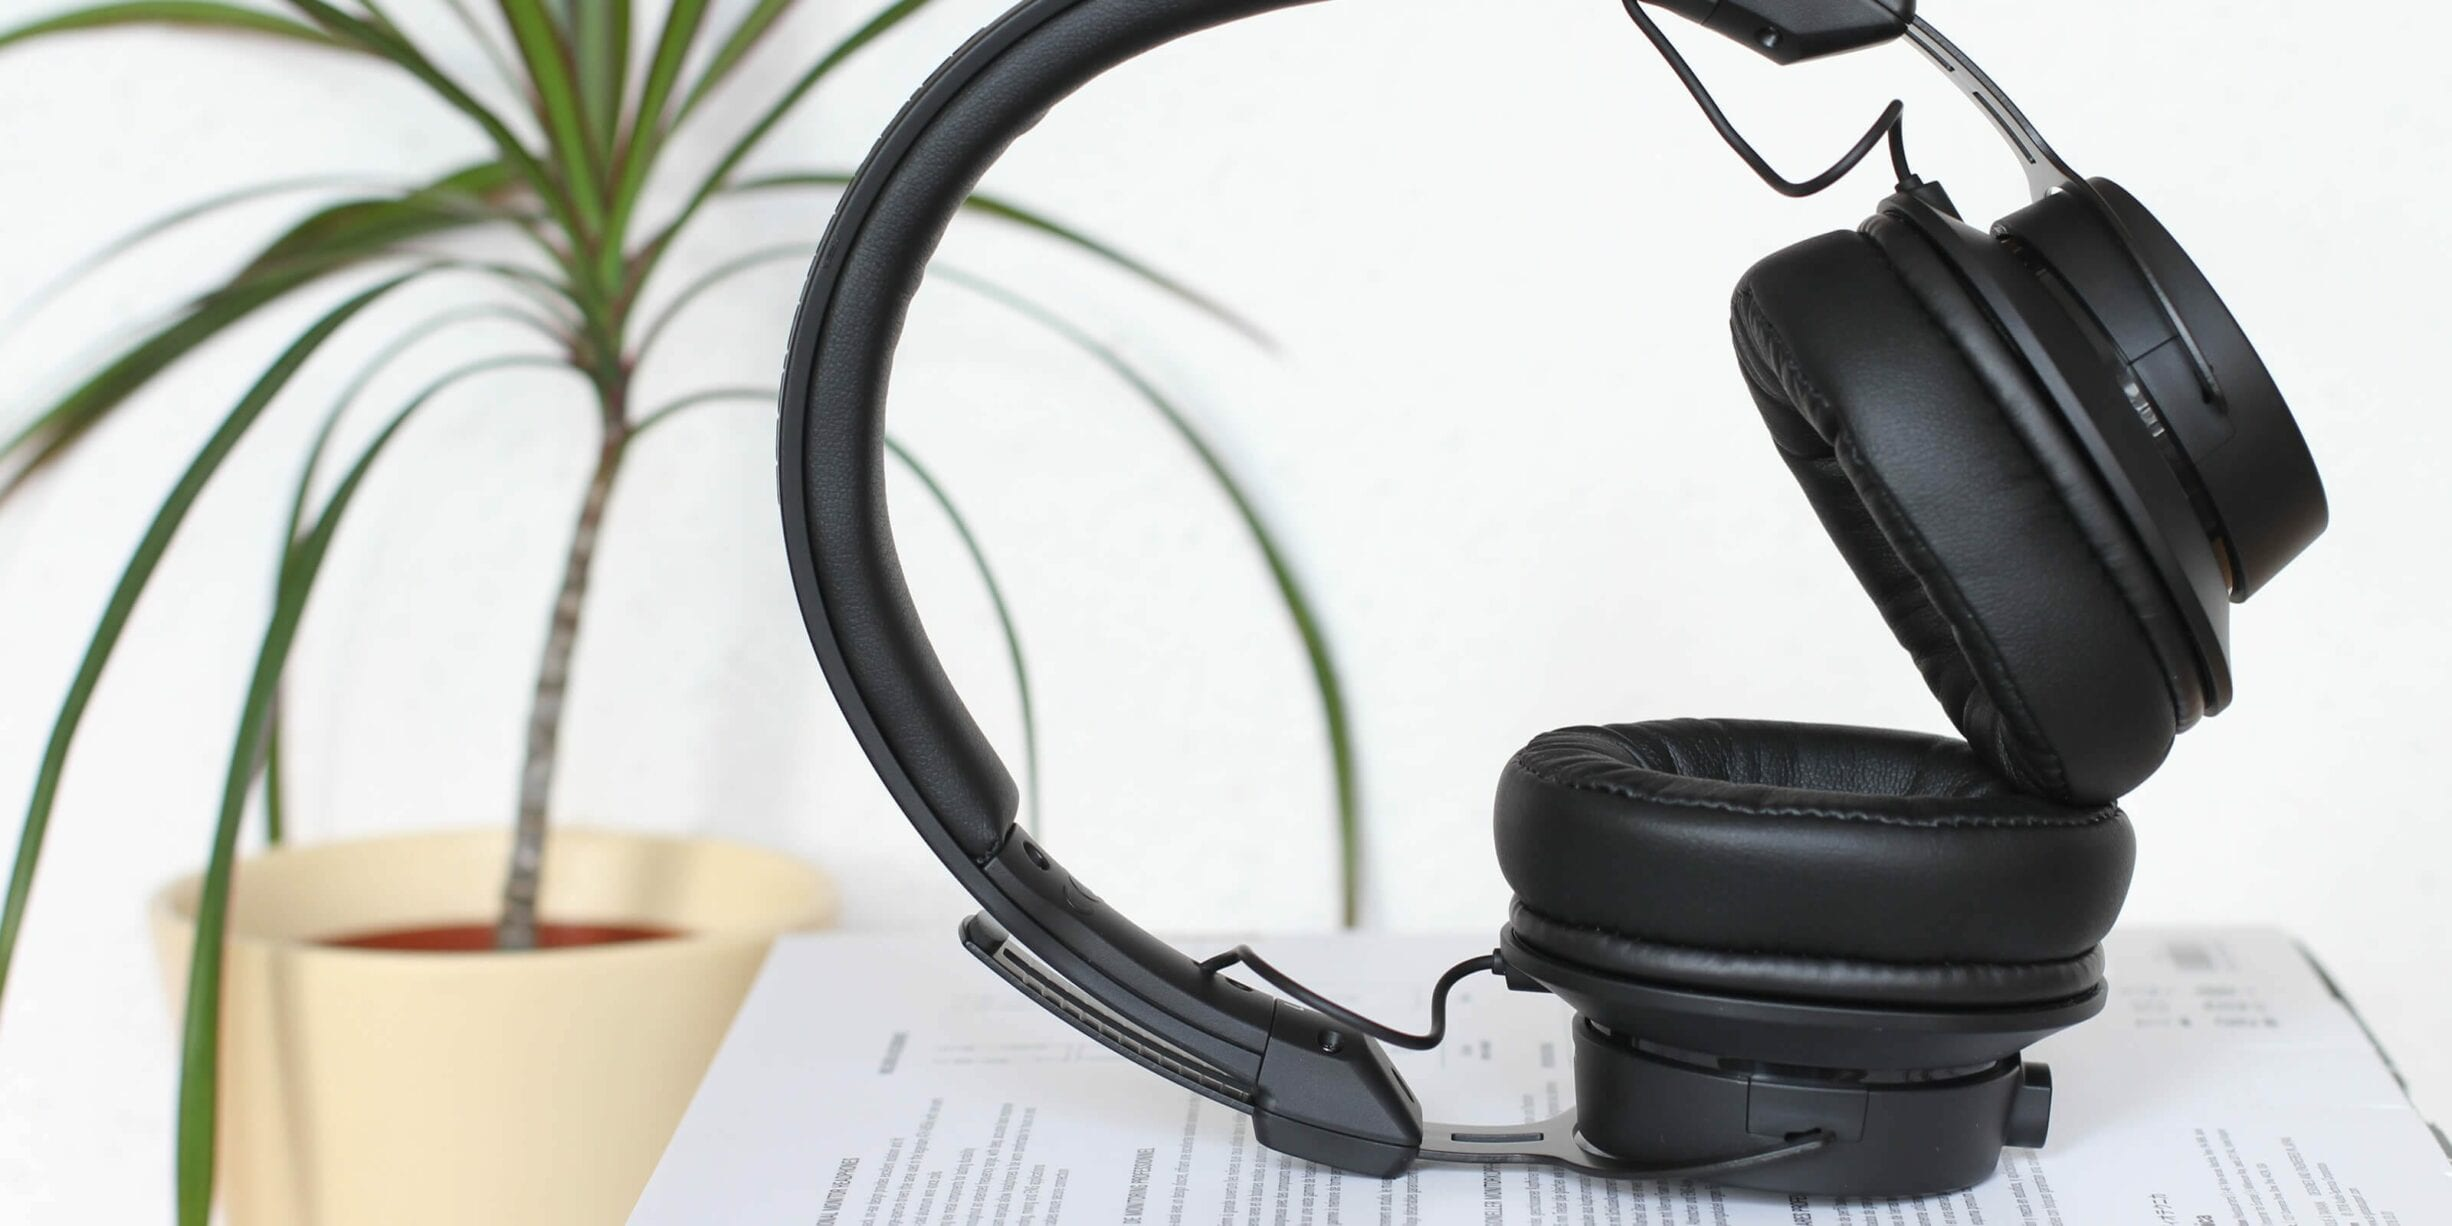 black headphones, paper, house plant